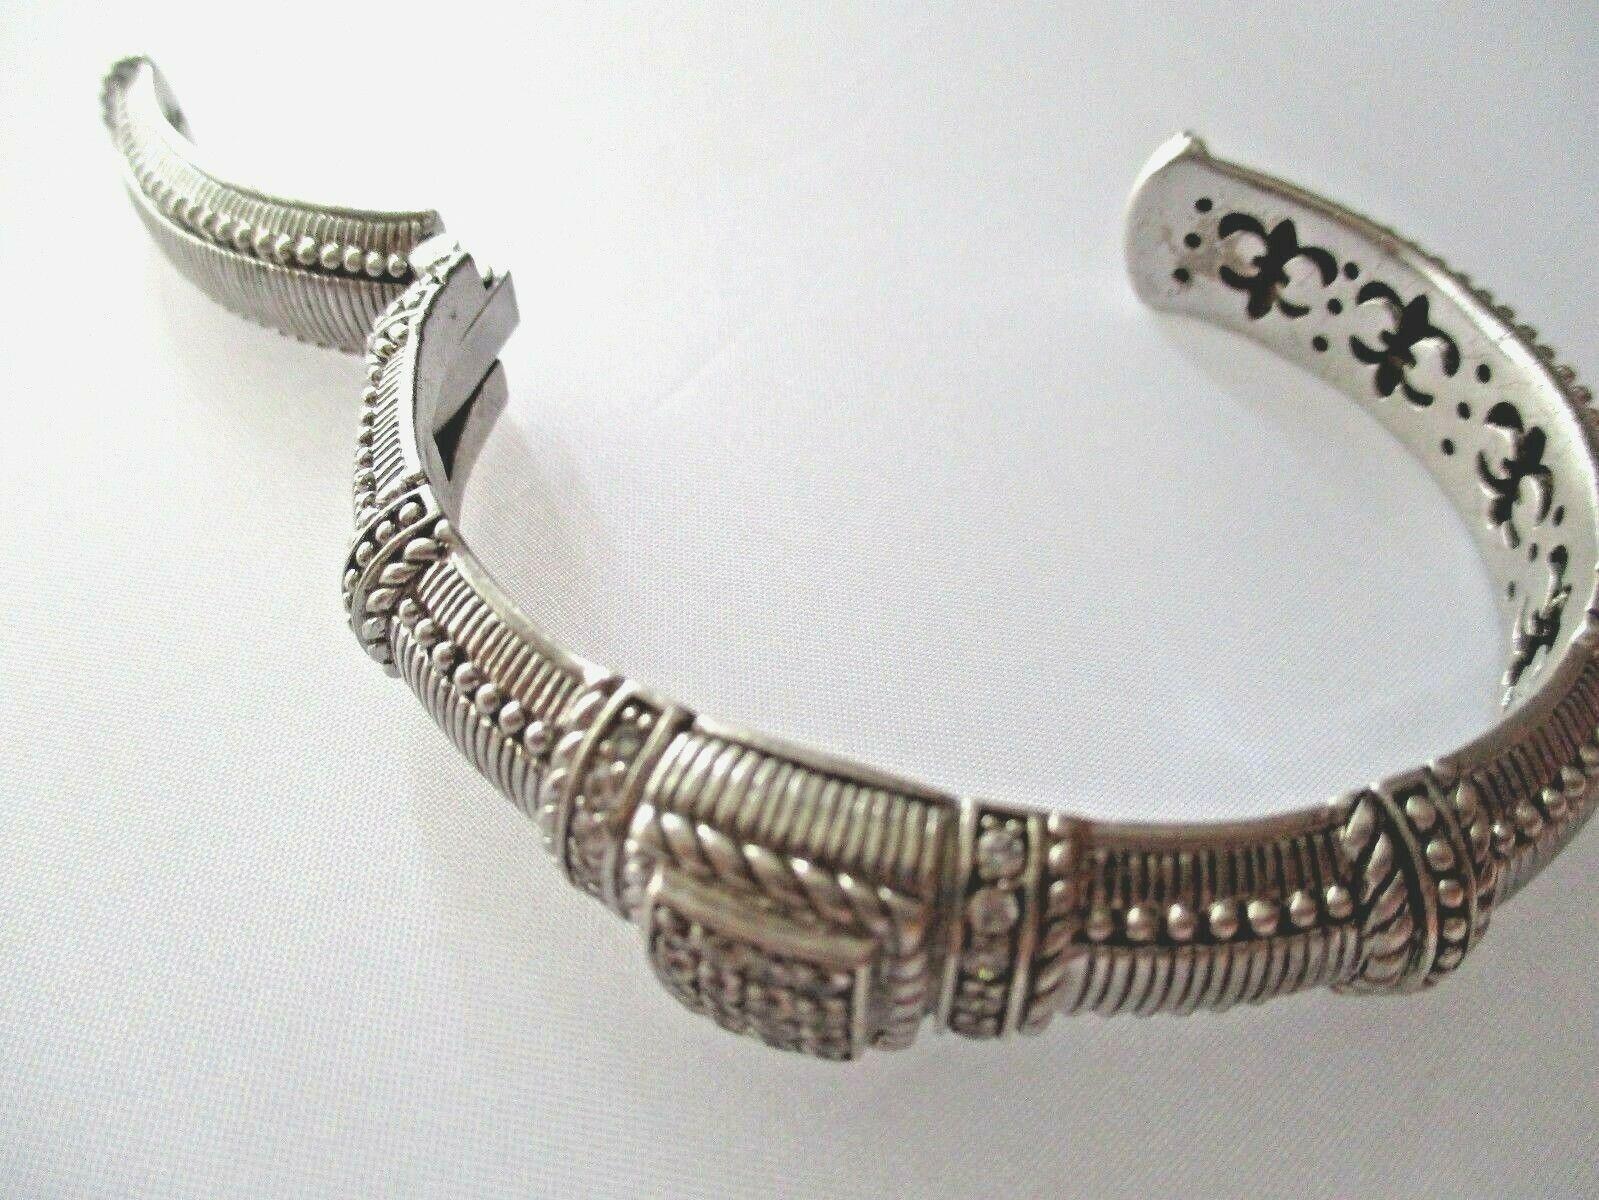 JUDITH RIPKA STERLING SILVER DIAMONIQUE CABLE CUFF BRACELET JR BOX & POUCH AVGE image 9